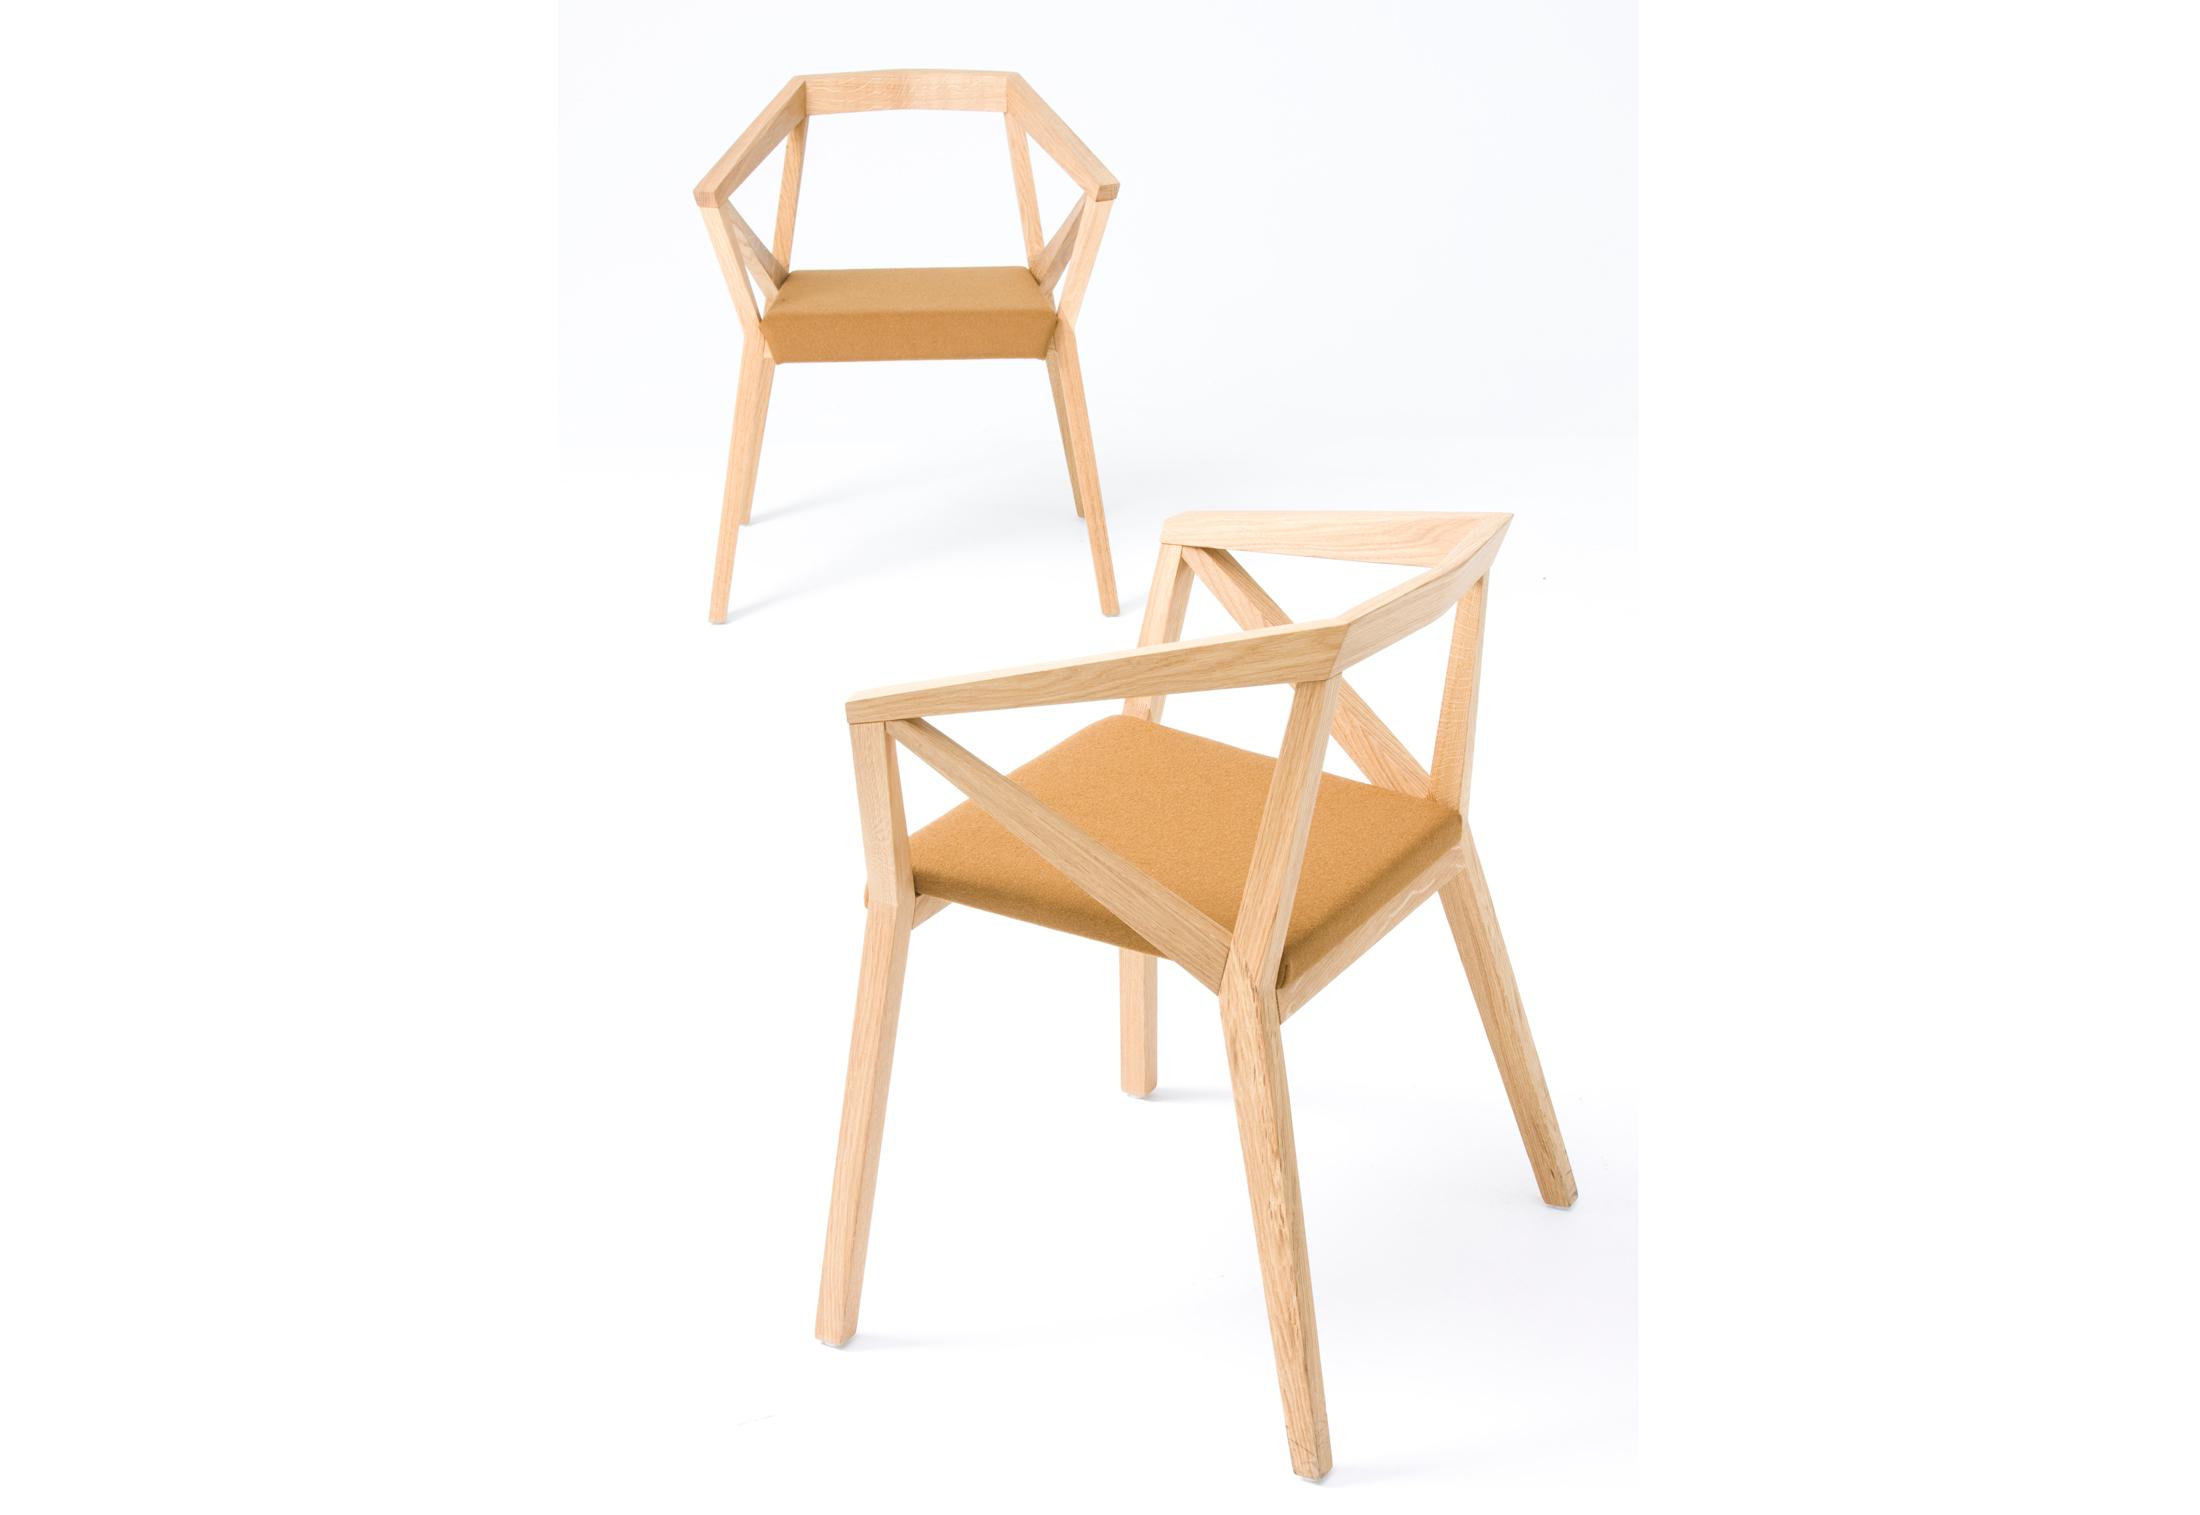 Yy Chair By Moroso Stylepark